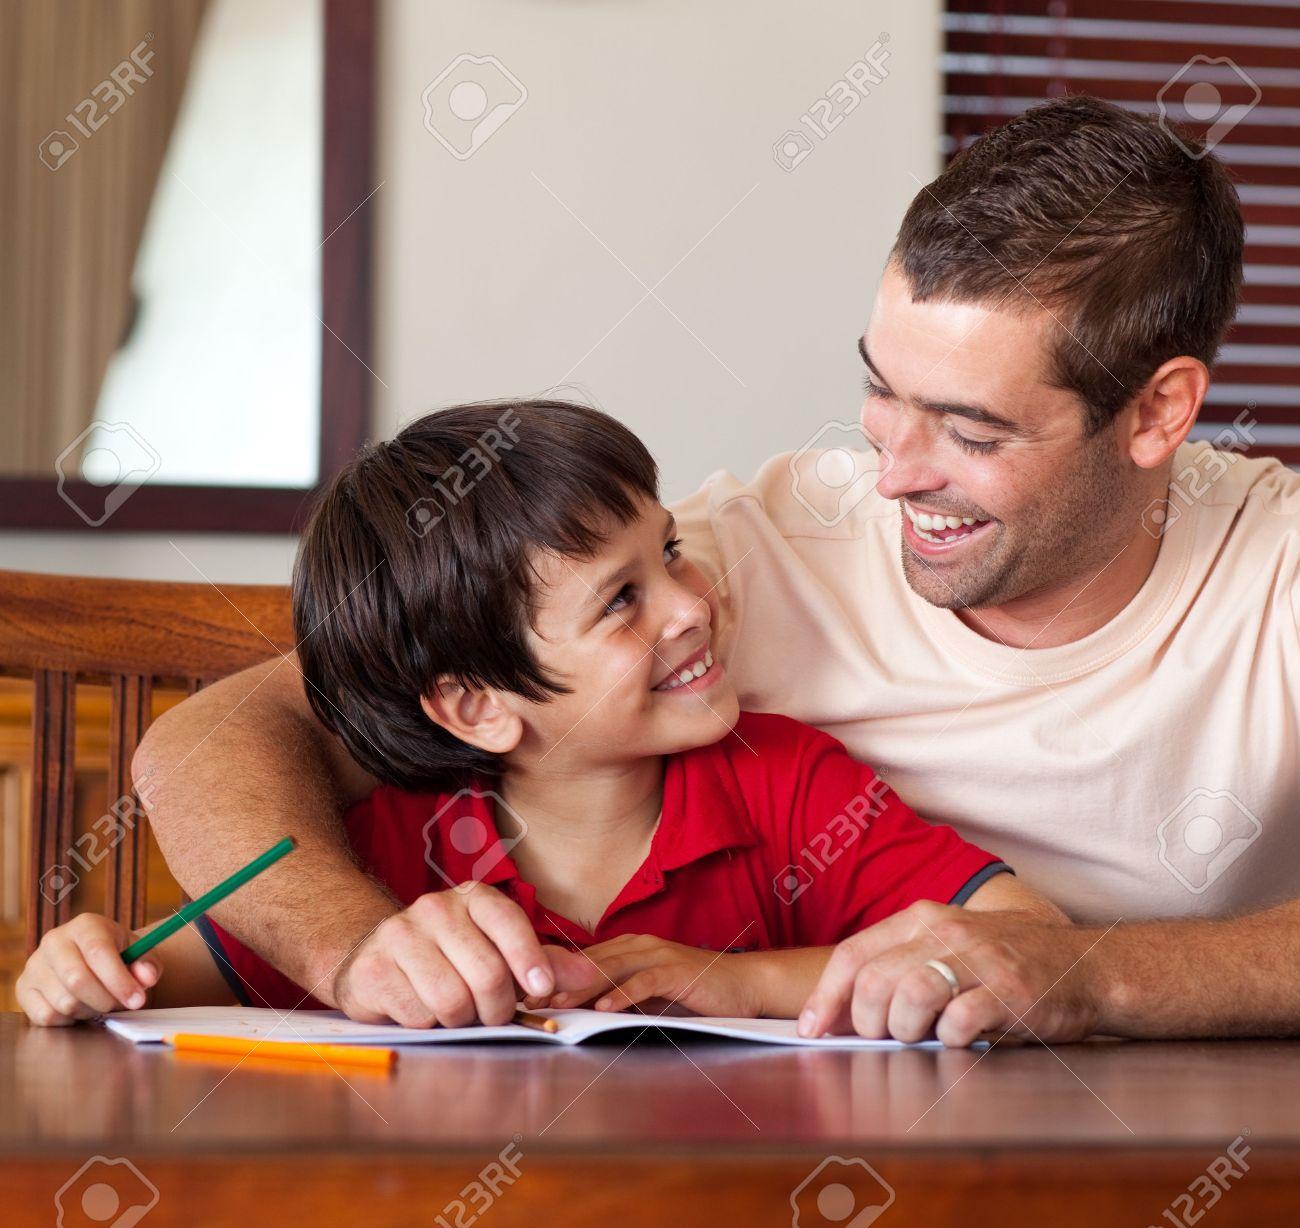 Chico lindo busca a su padre Foto de archivo - 10162717